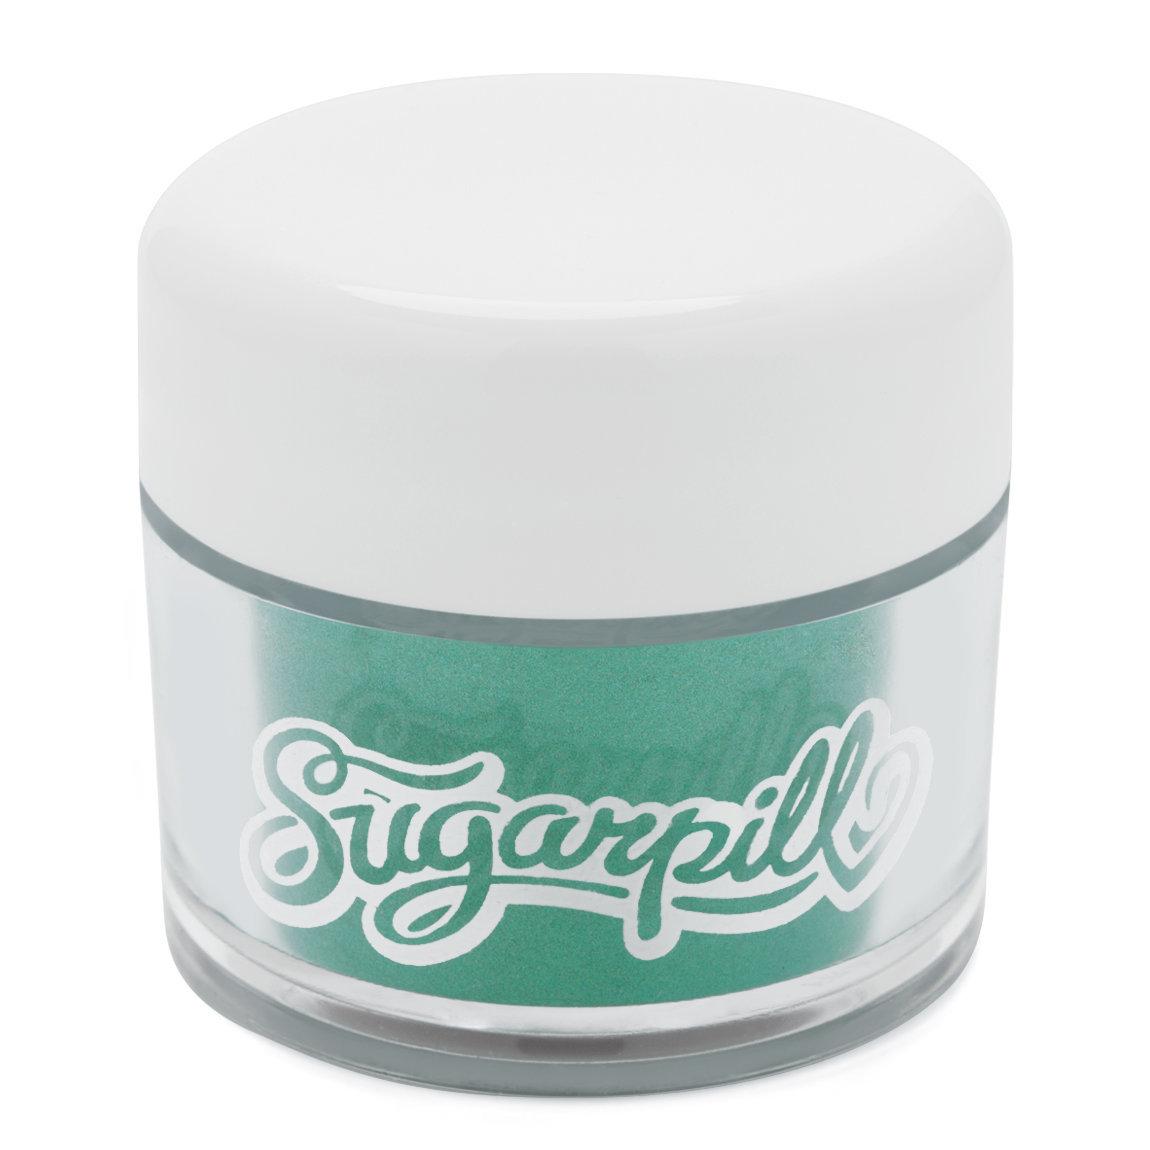 Sugarpill Cosmetics Loose Eyeshadow Hug Life alternative view 1.